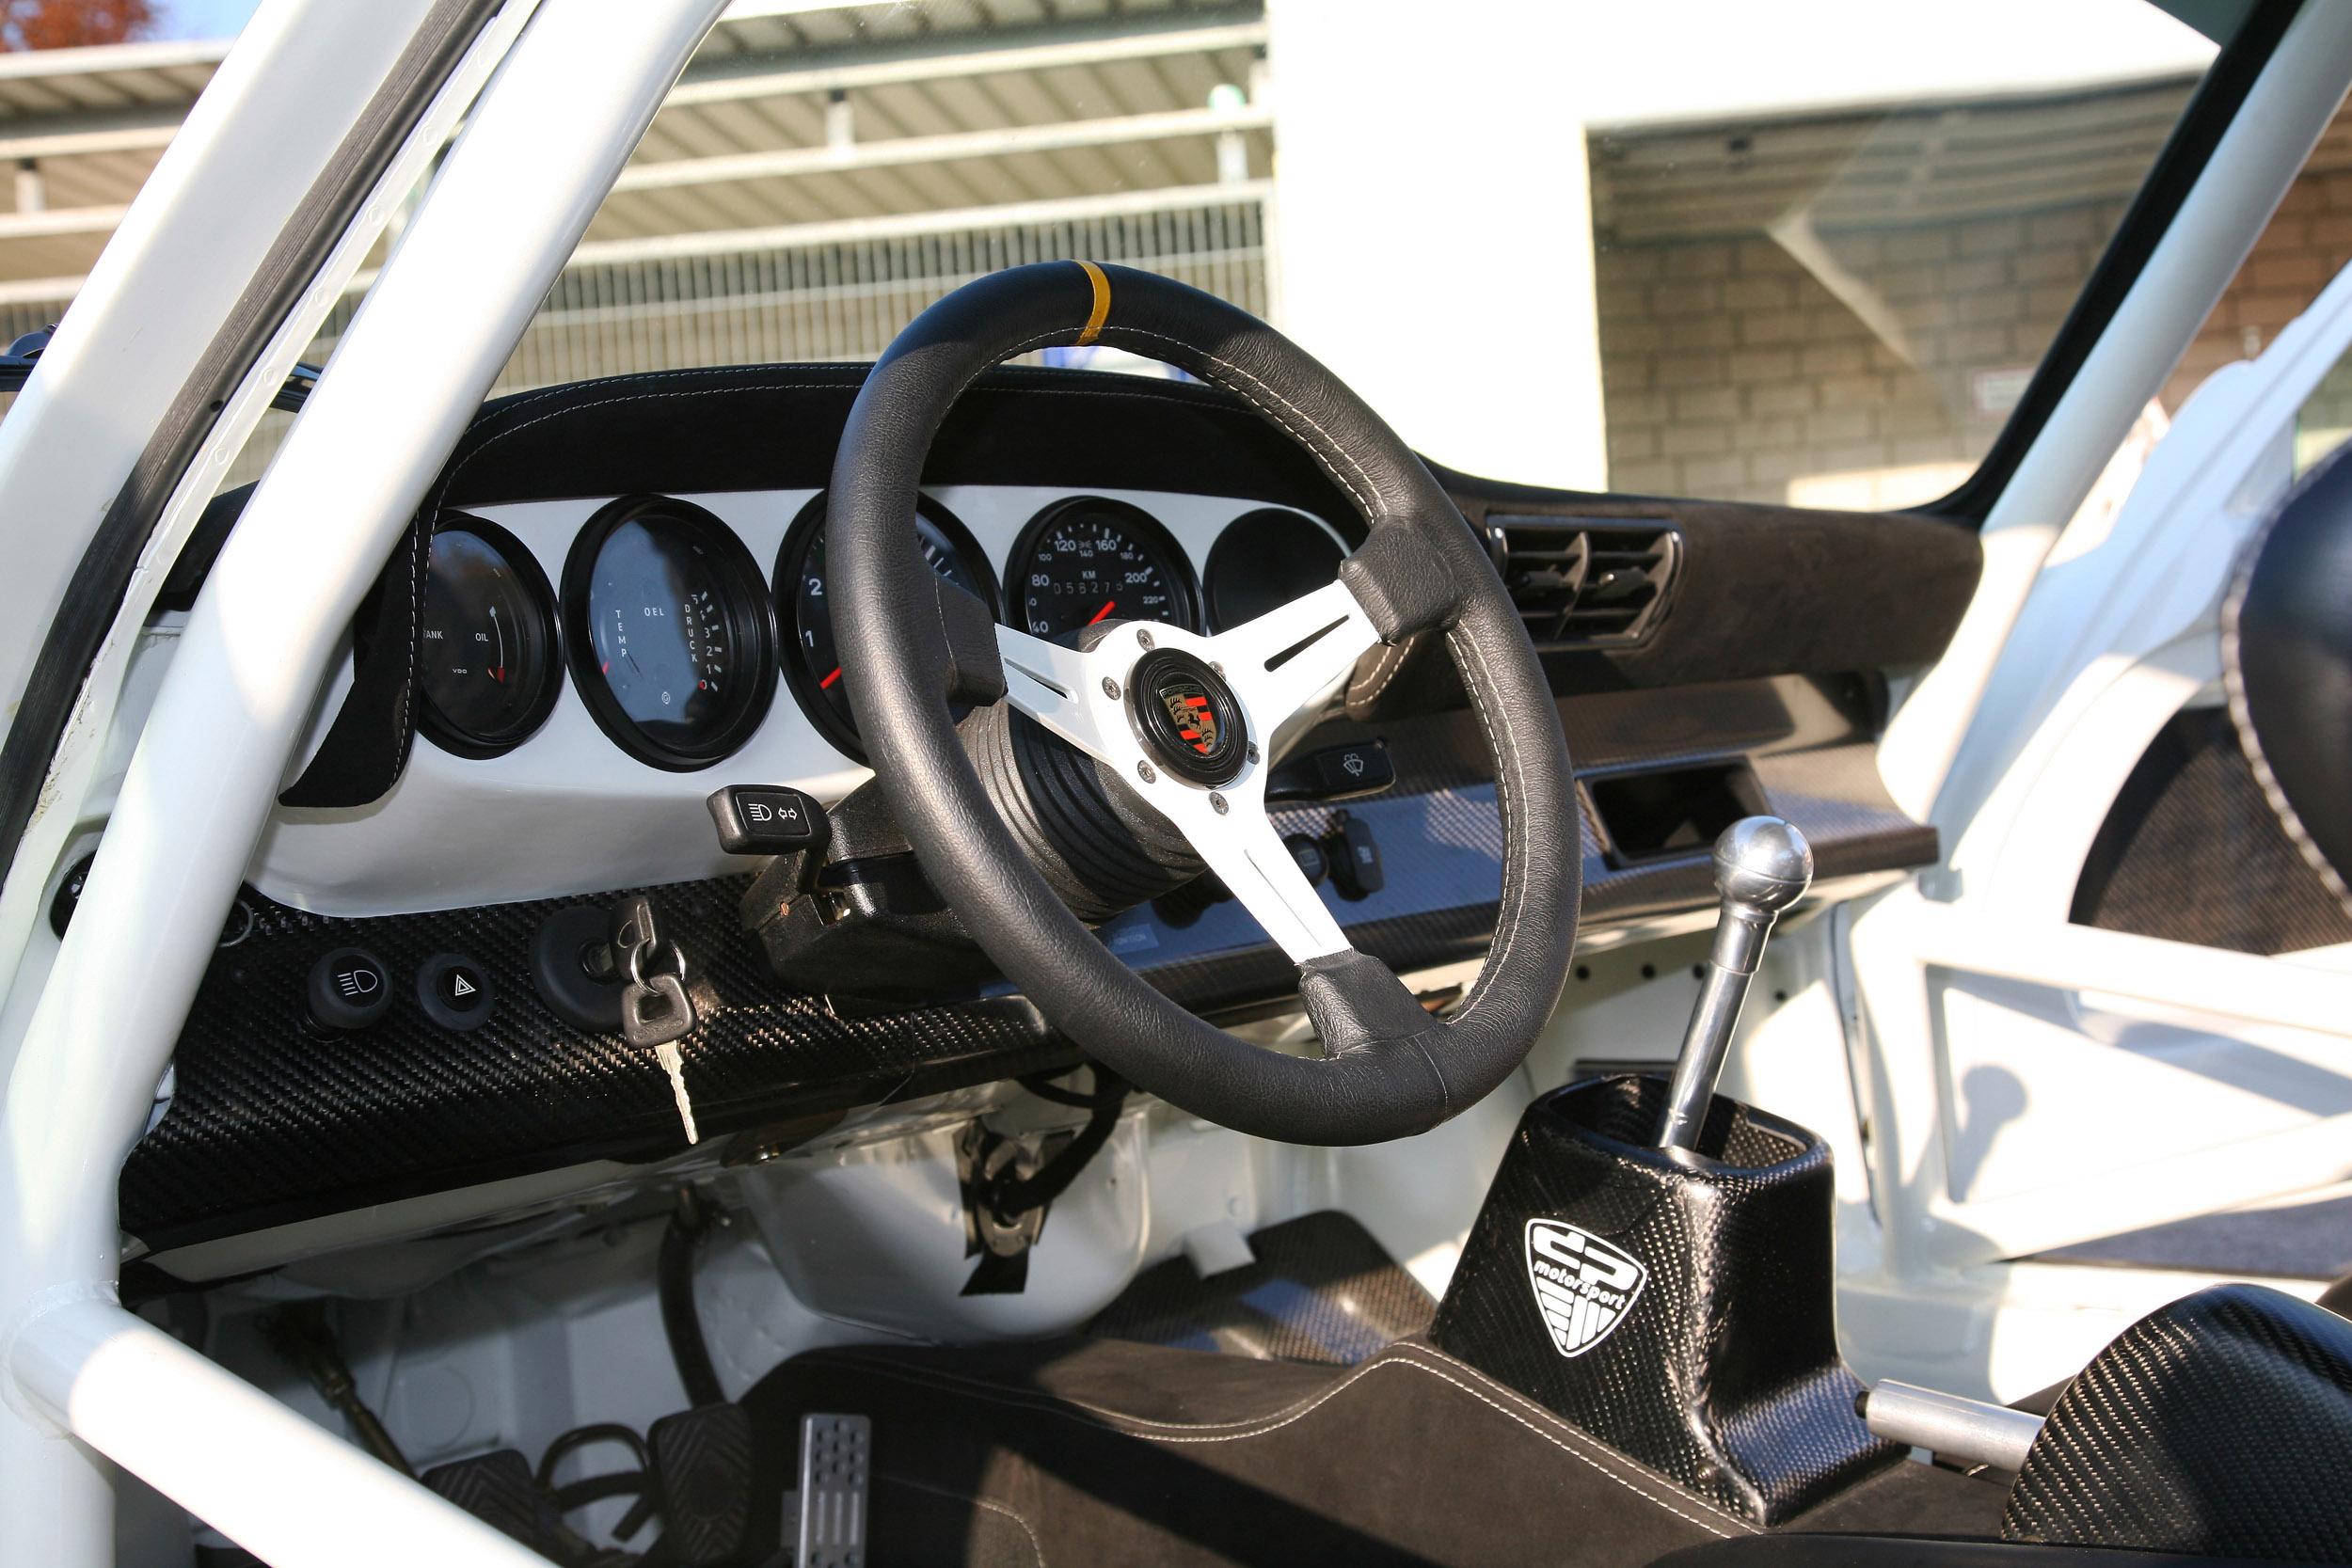 http://www.automobilesreview.com/img/dp-motorsport-1973-porsche-911/dp-motorsport-1973-porsche-911-18.jpg